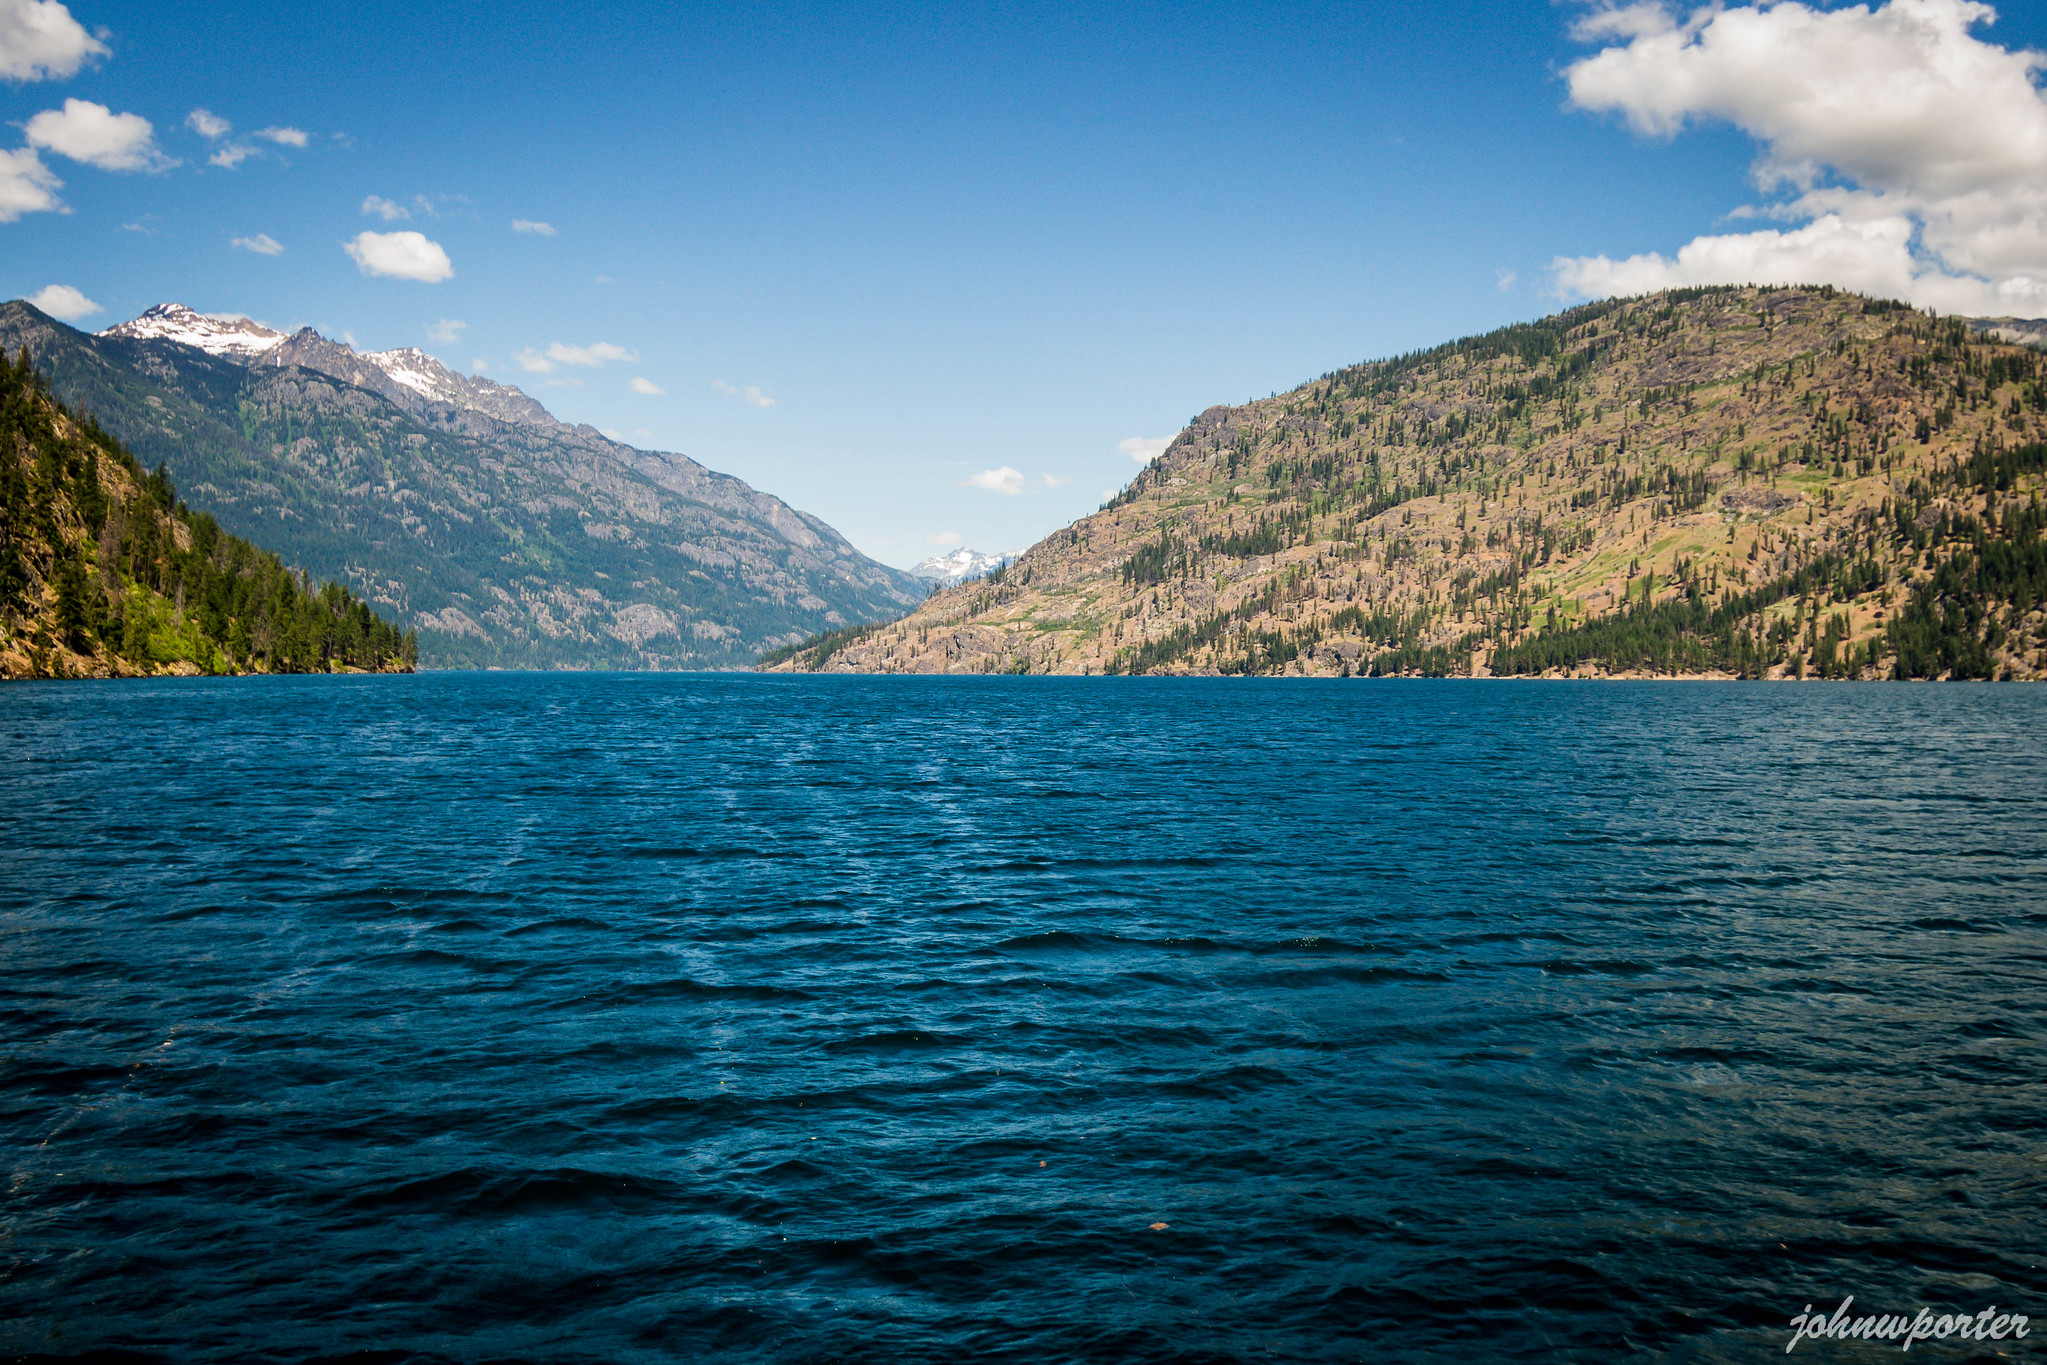 Ferry ride on Lake Chelan